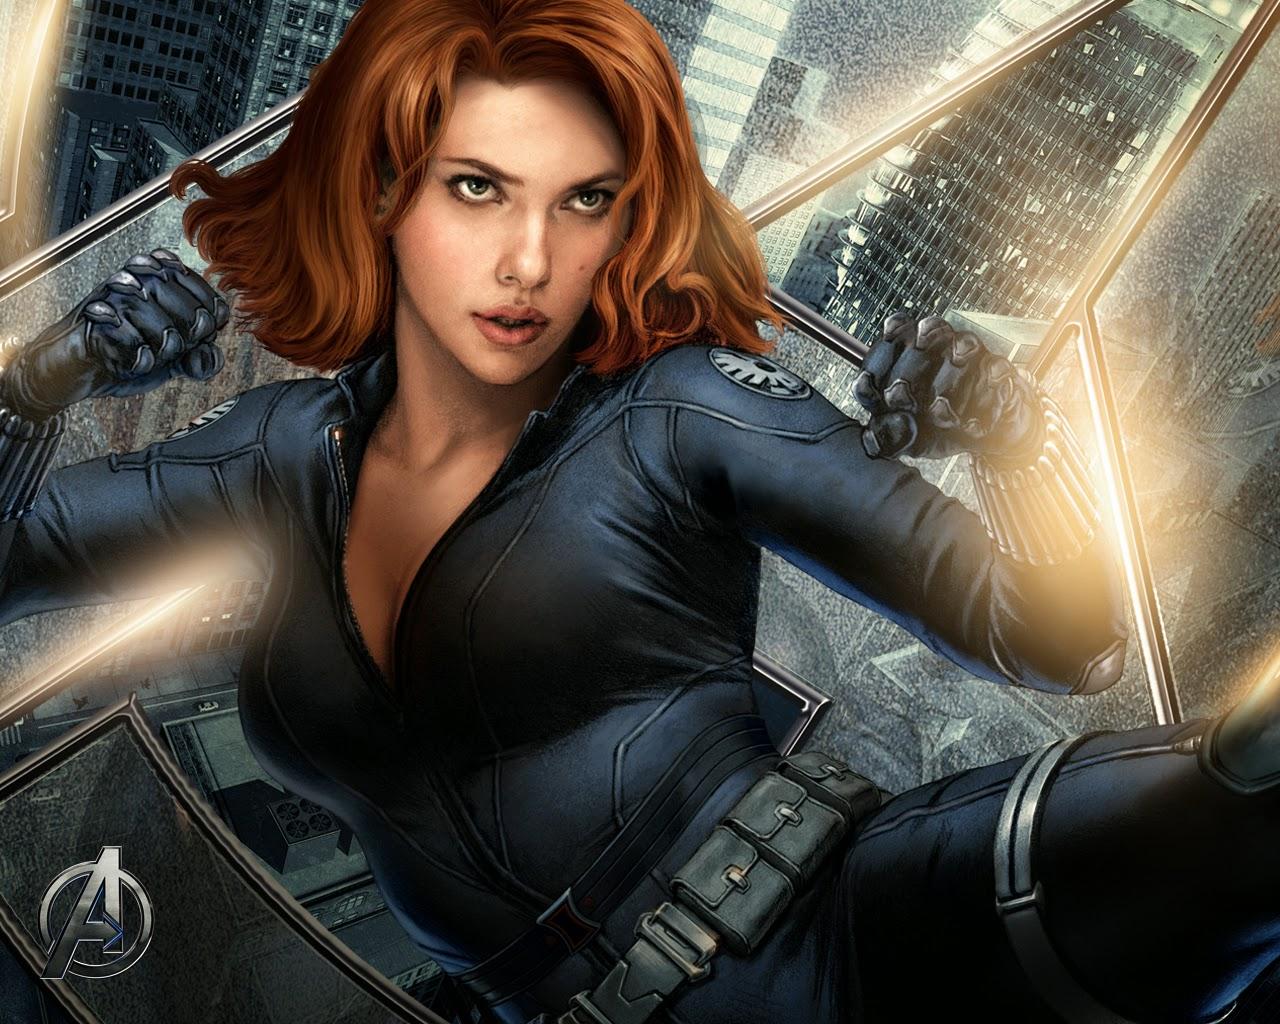 Black Widow The Movie